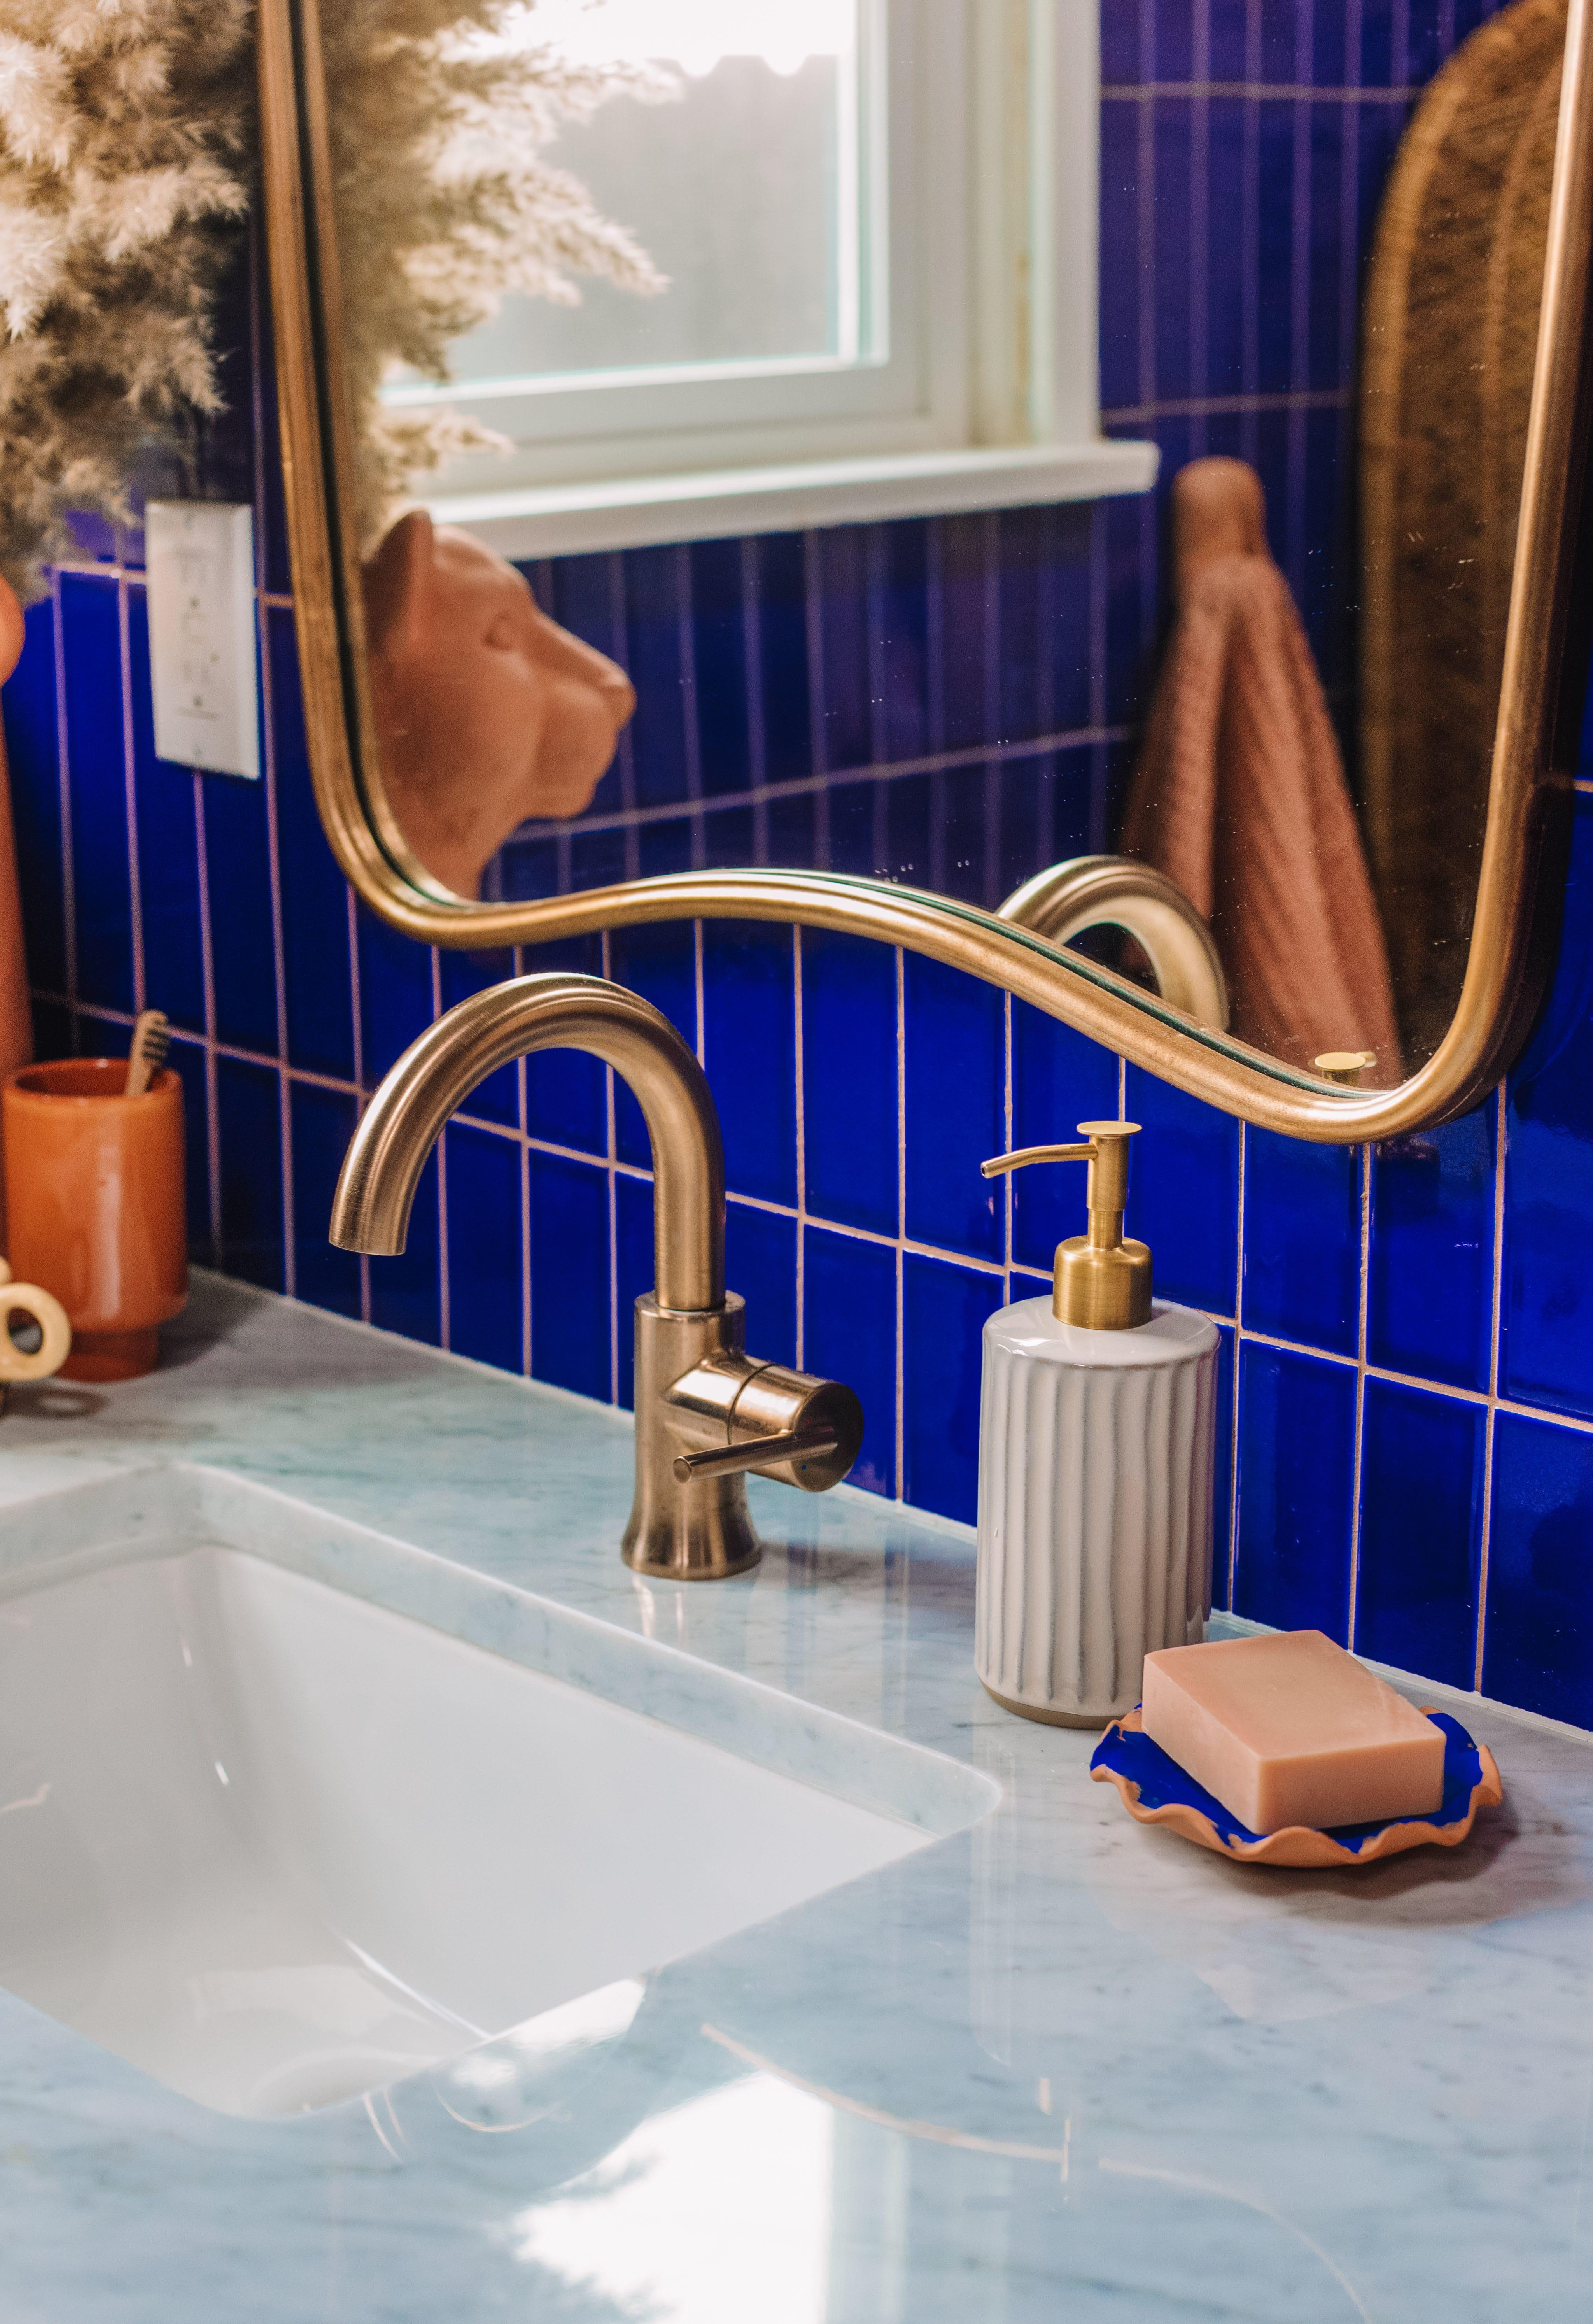 Mirror_vanity-faucetfeat.jpg#asset:4441